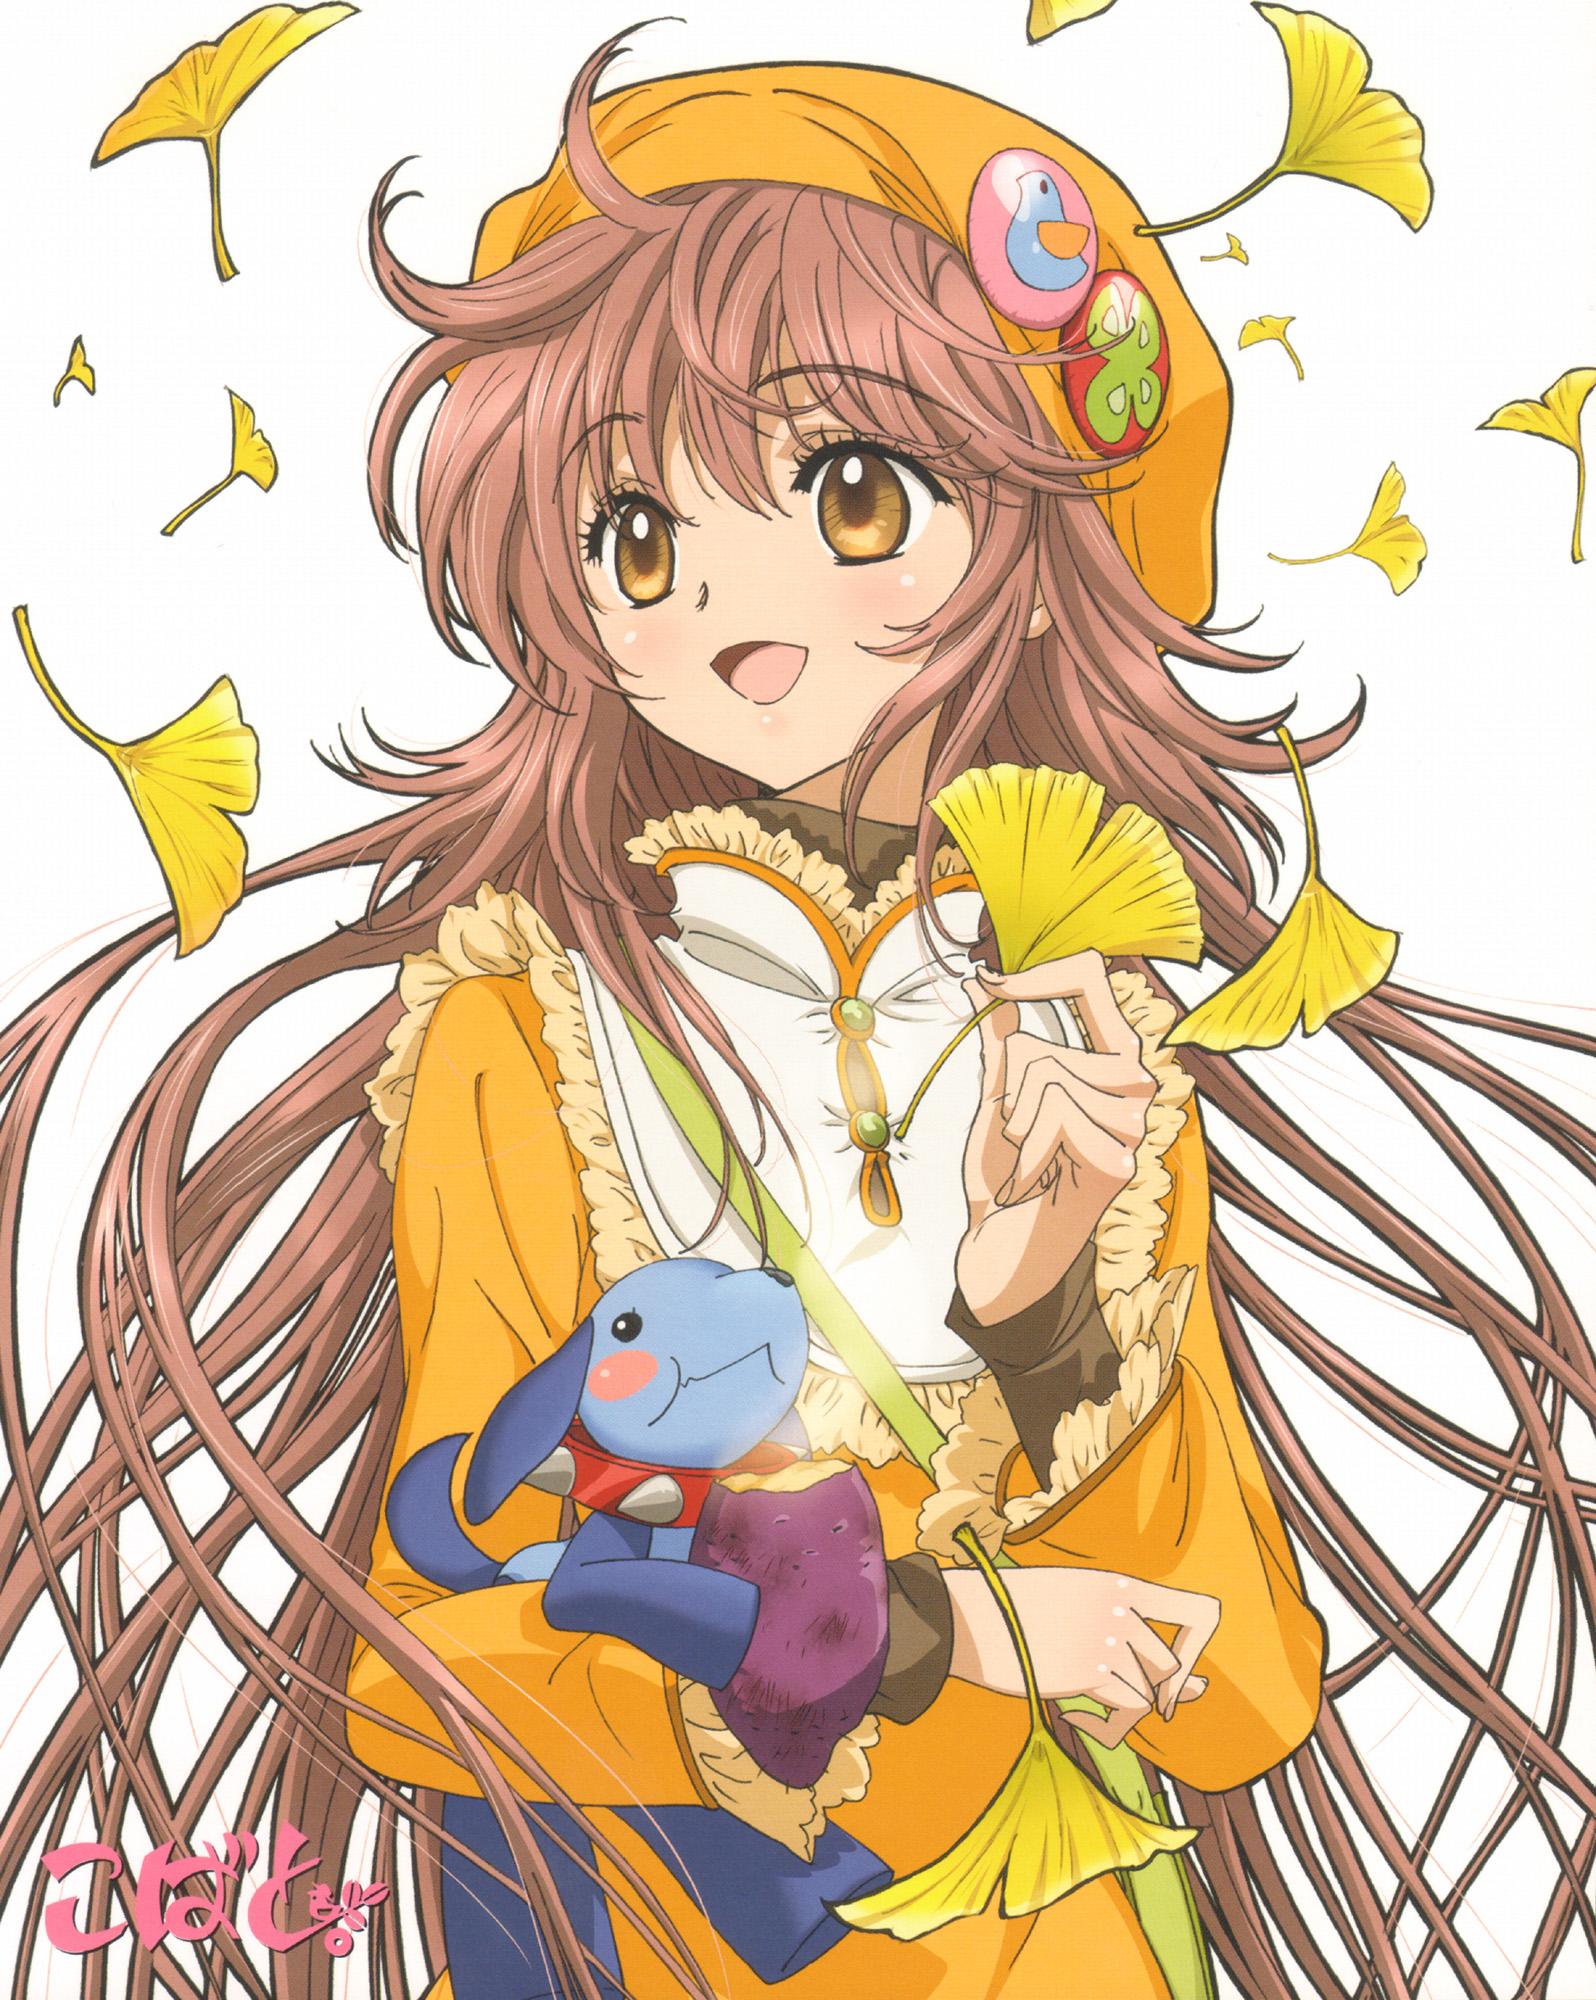 Kobato. | page 2 of 18 - Zerochan Anime Image Board